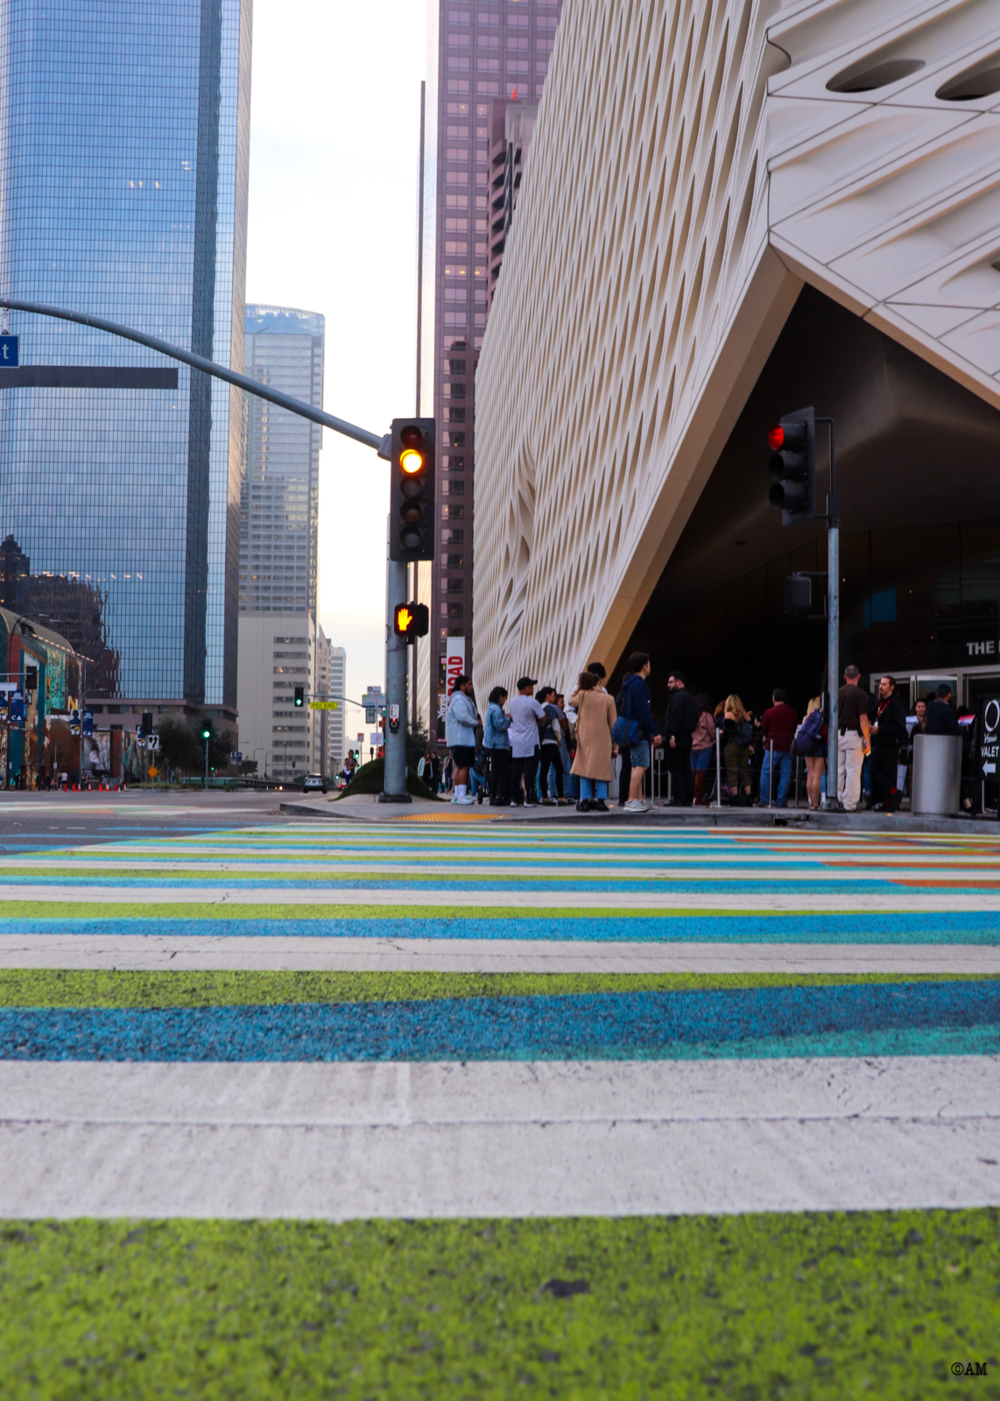 The multi-colored crosswalk by the Venezuelan artist, Carlos Cruz-Diez, outside The Broad.